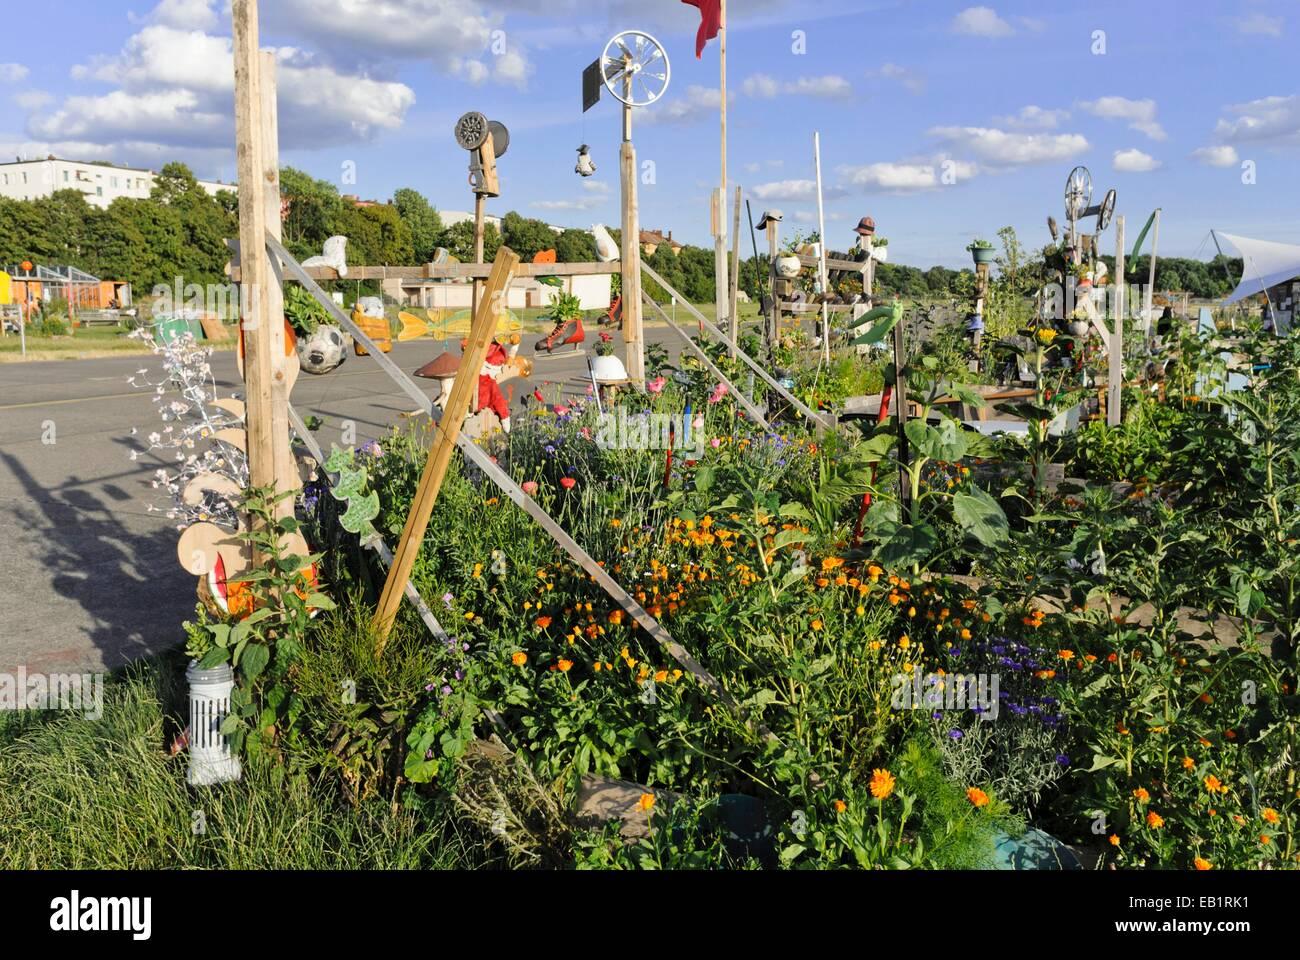 Community garden, Tempelhofer Freiheit, Berlin, Germany - Stock Image